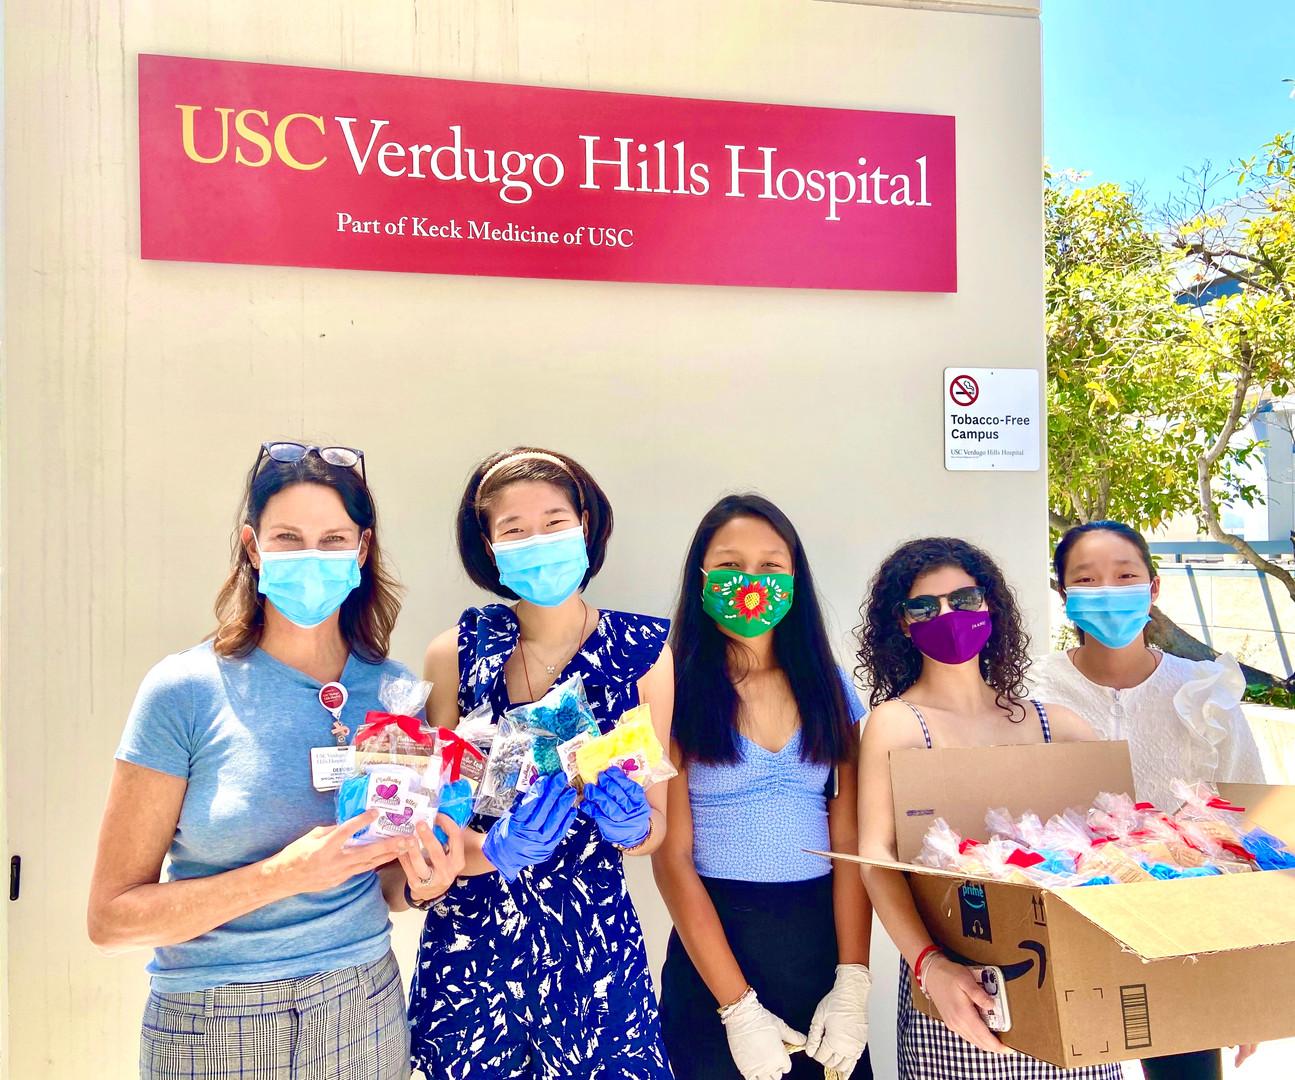 USC Verdugo Hills Hospital